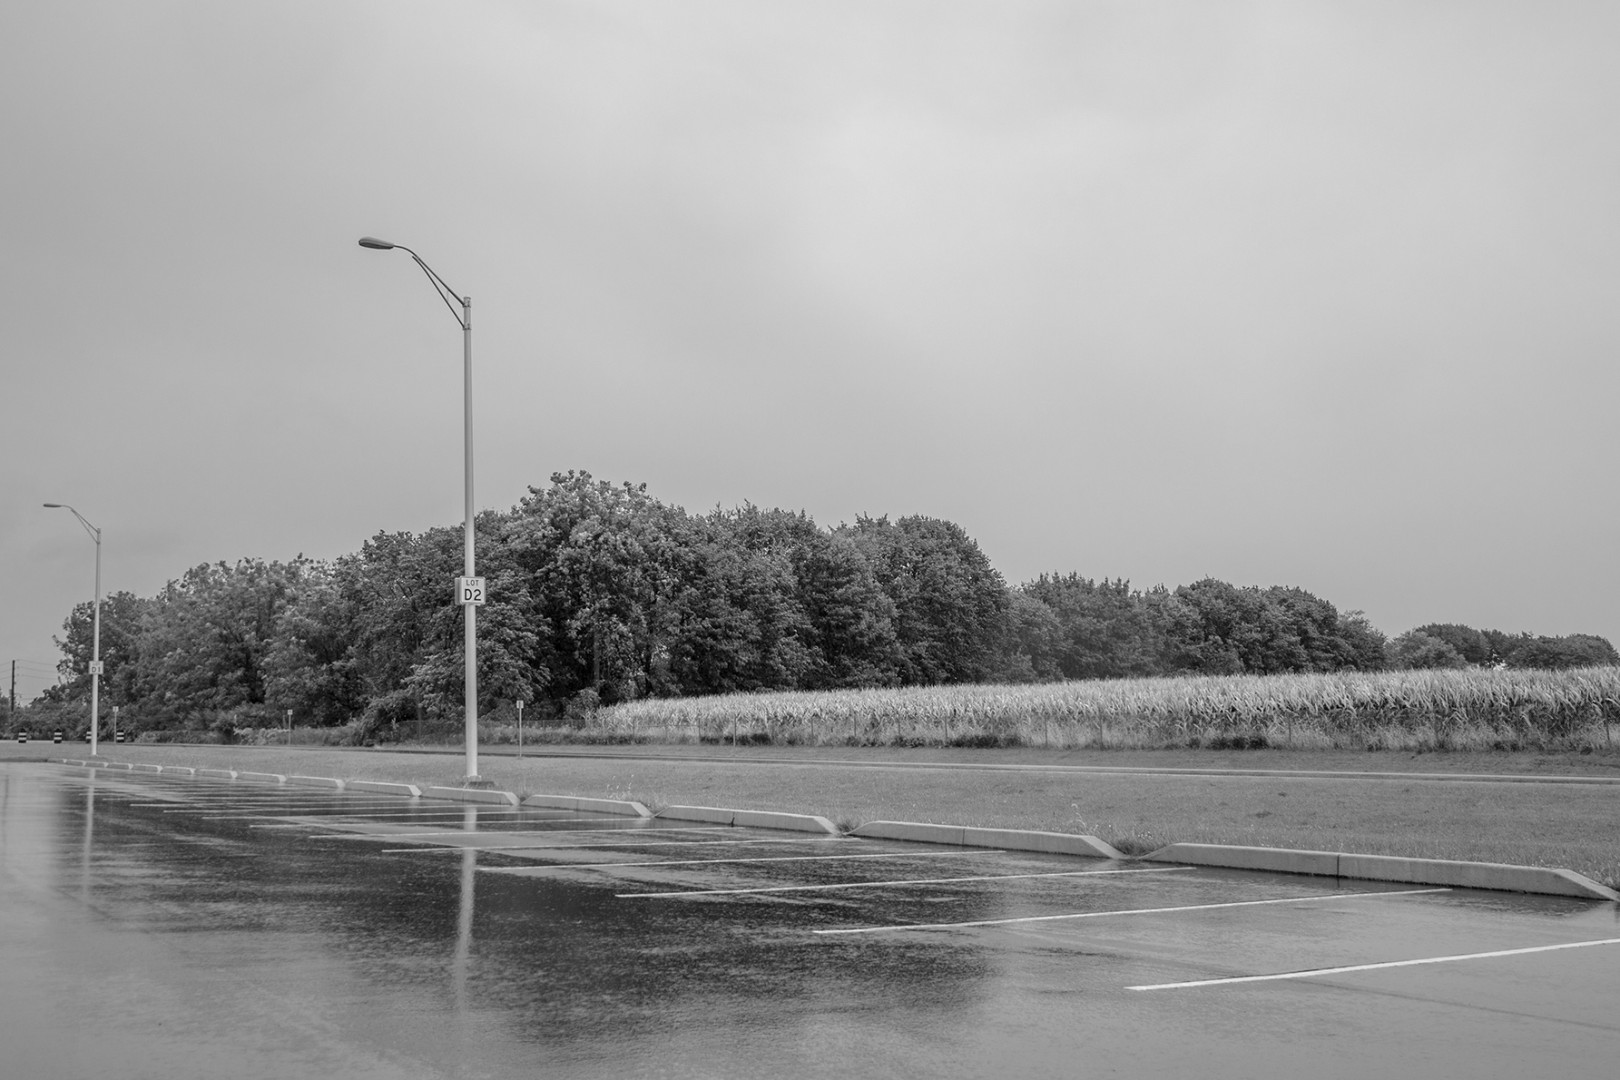 graytone,gray,grey,tone,landscape,lightest,parking